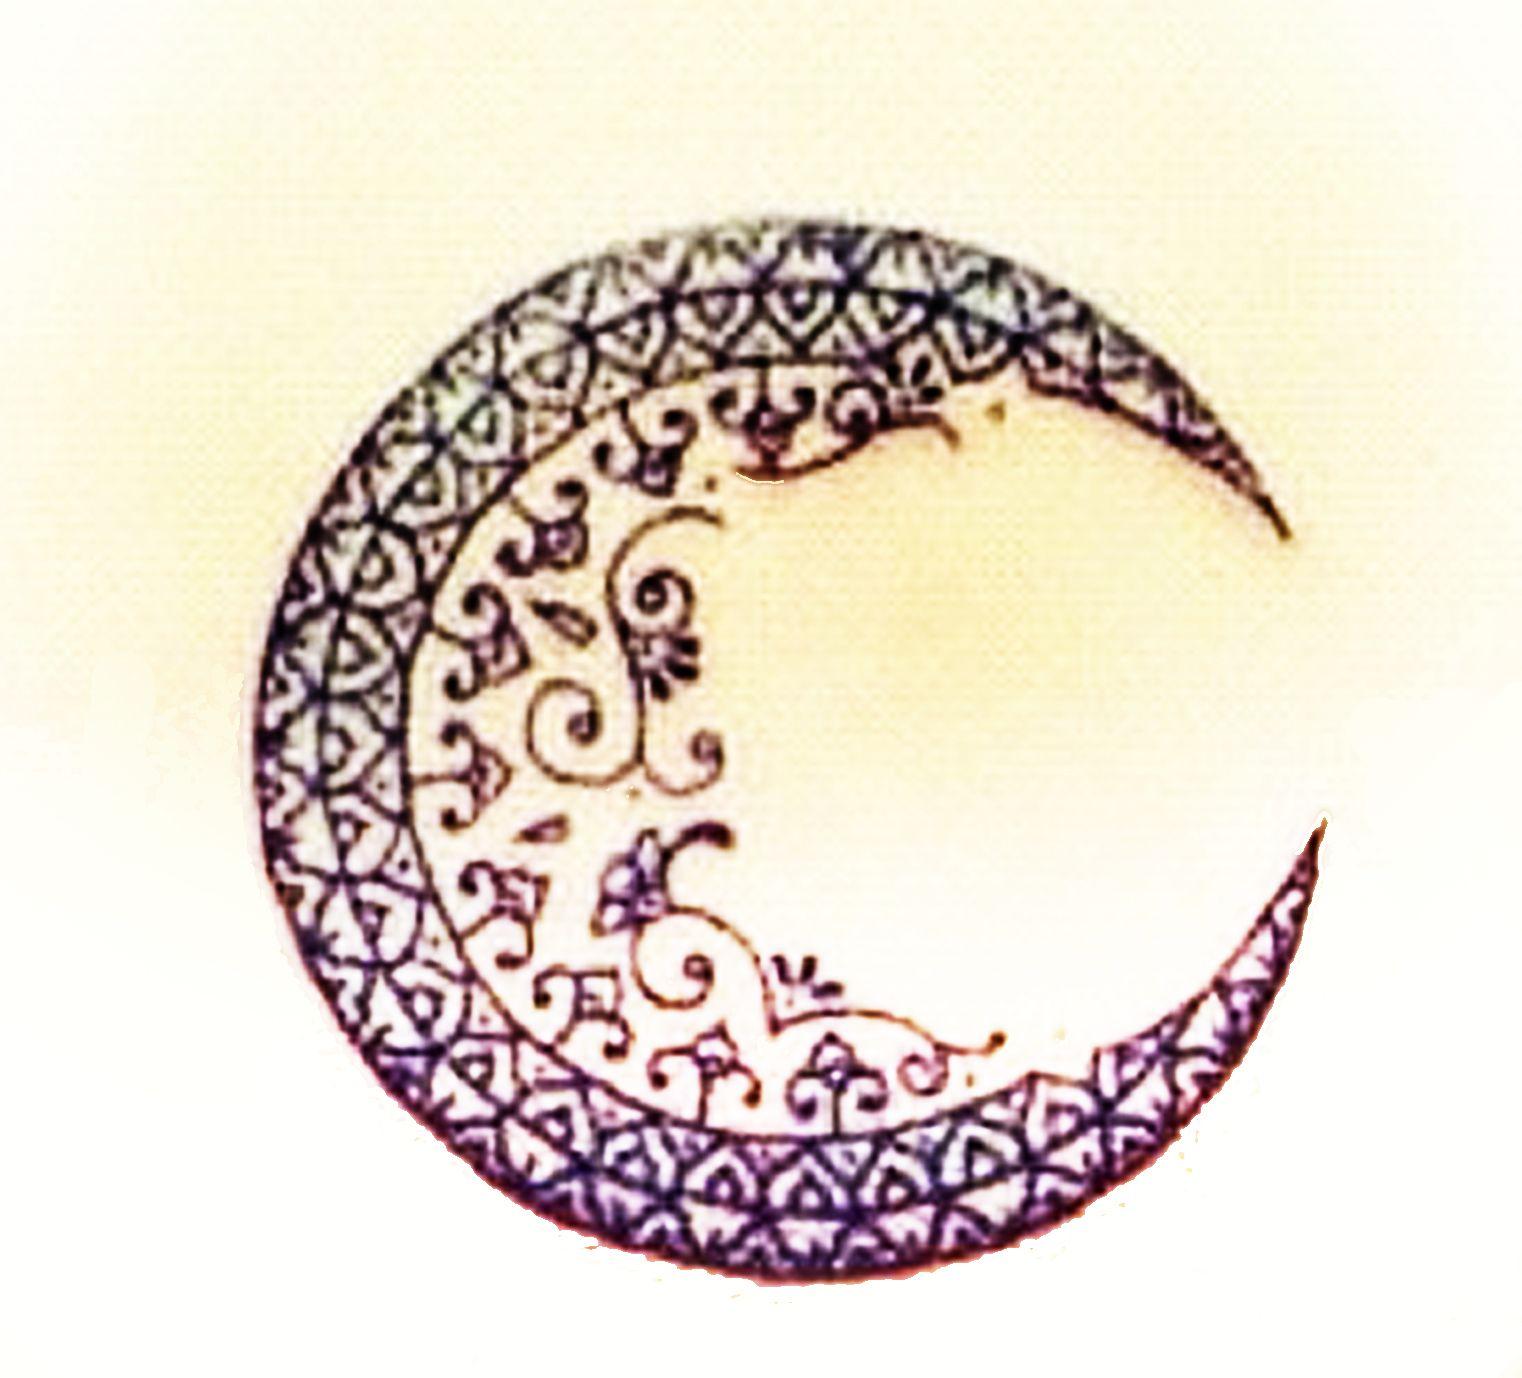 Moon tattoo clair de lune tatou pinterest clair de lune lune et tatouages - Tatouage de lune ...